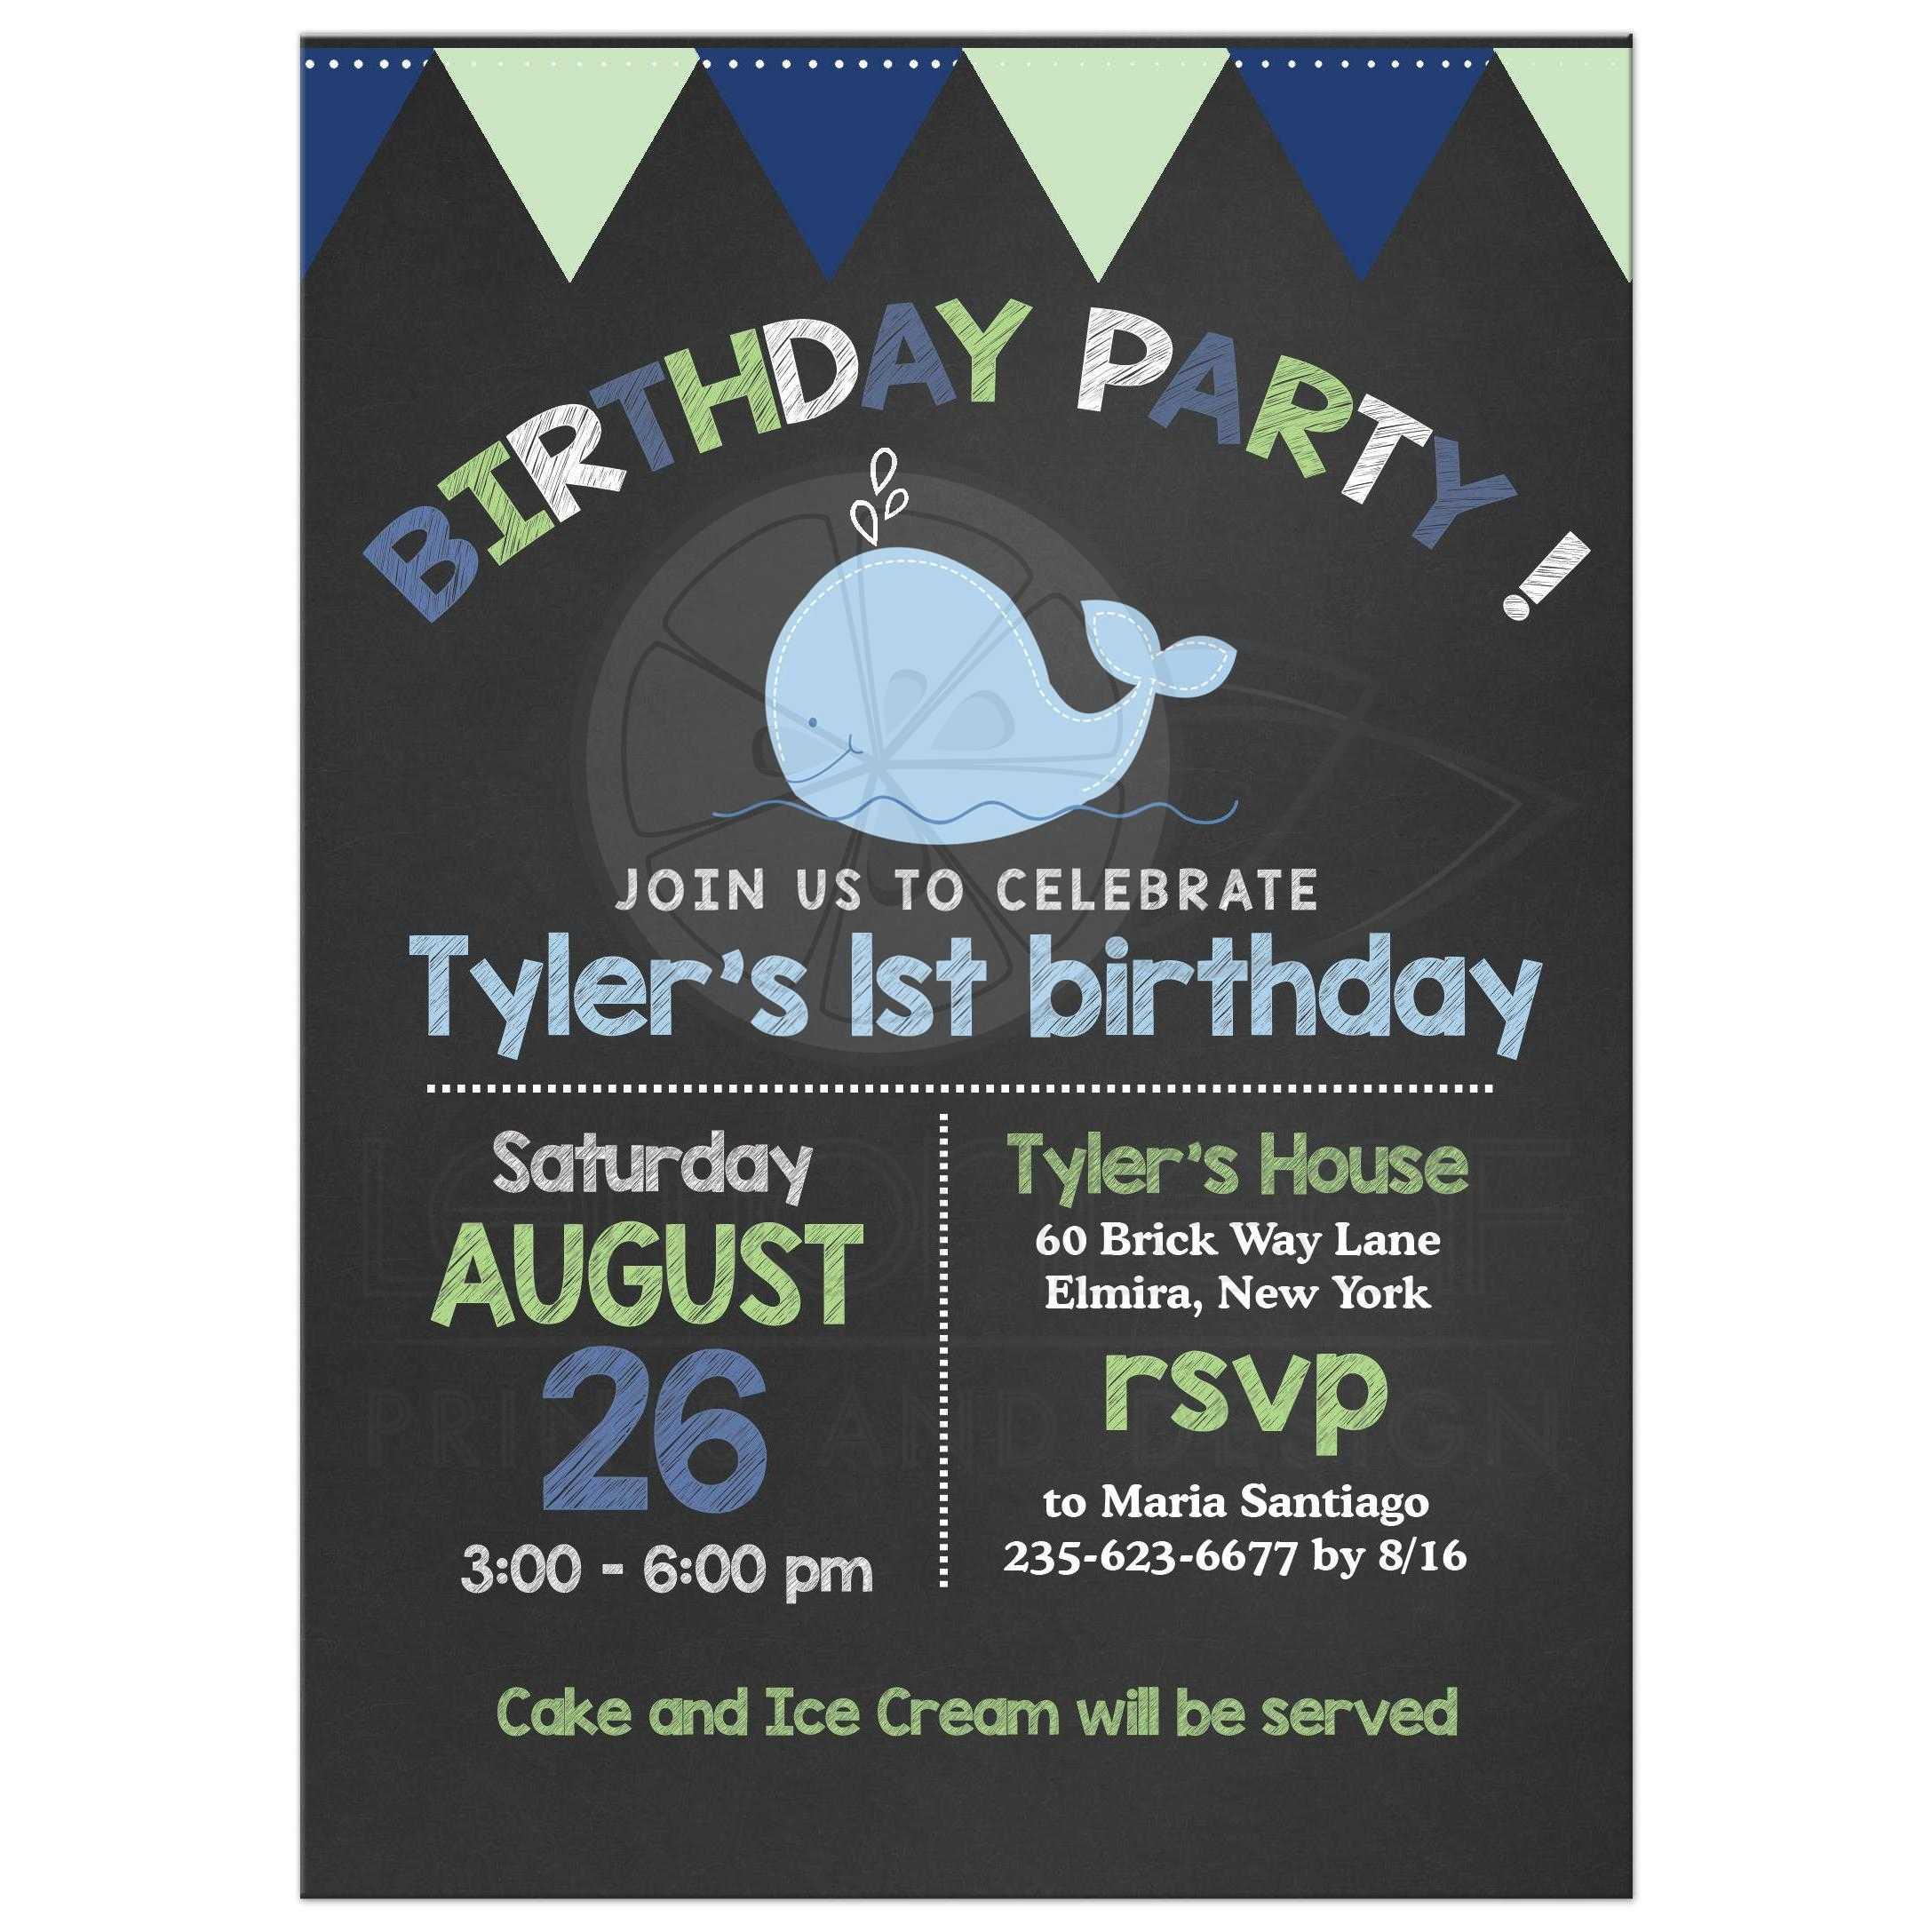 little whale chalkboard birthday invitation navy blue mint green